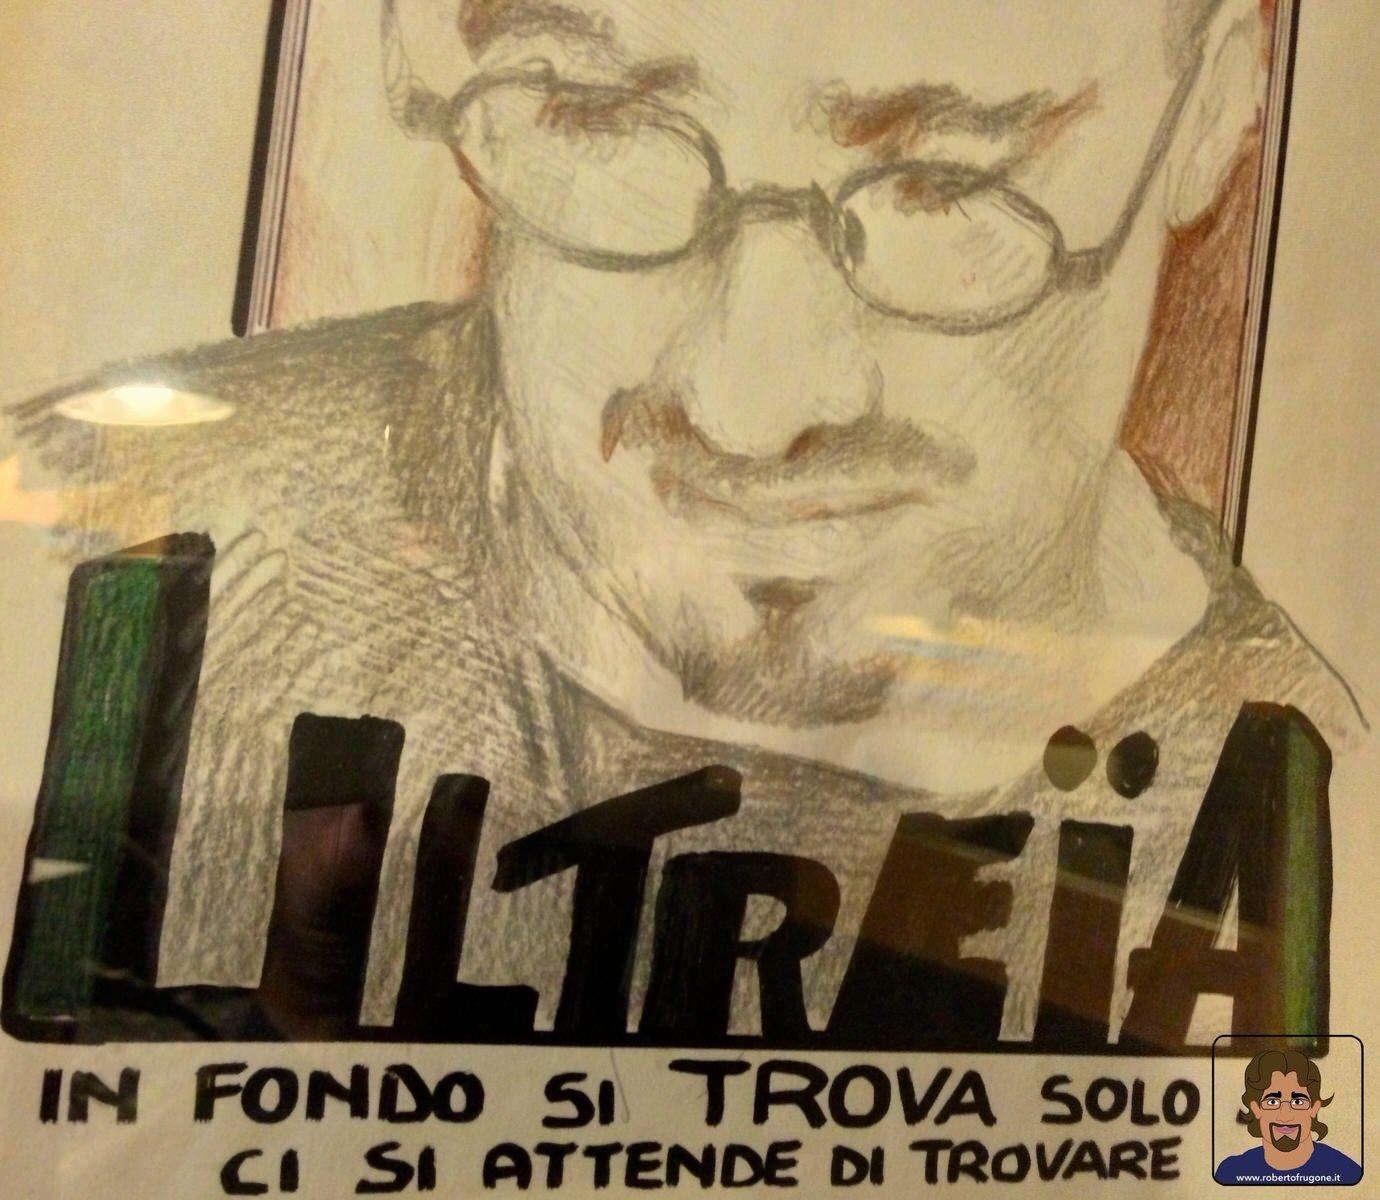 Totem Studio Sala Prove Musicali Casarza Ligure disegno copertina album Ultreia